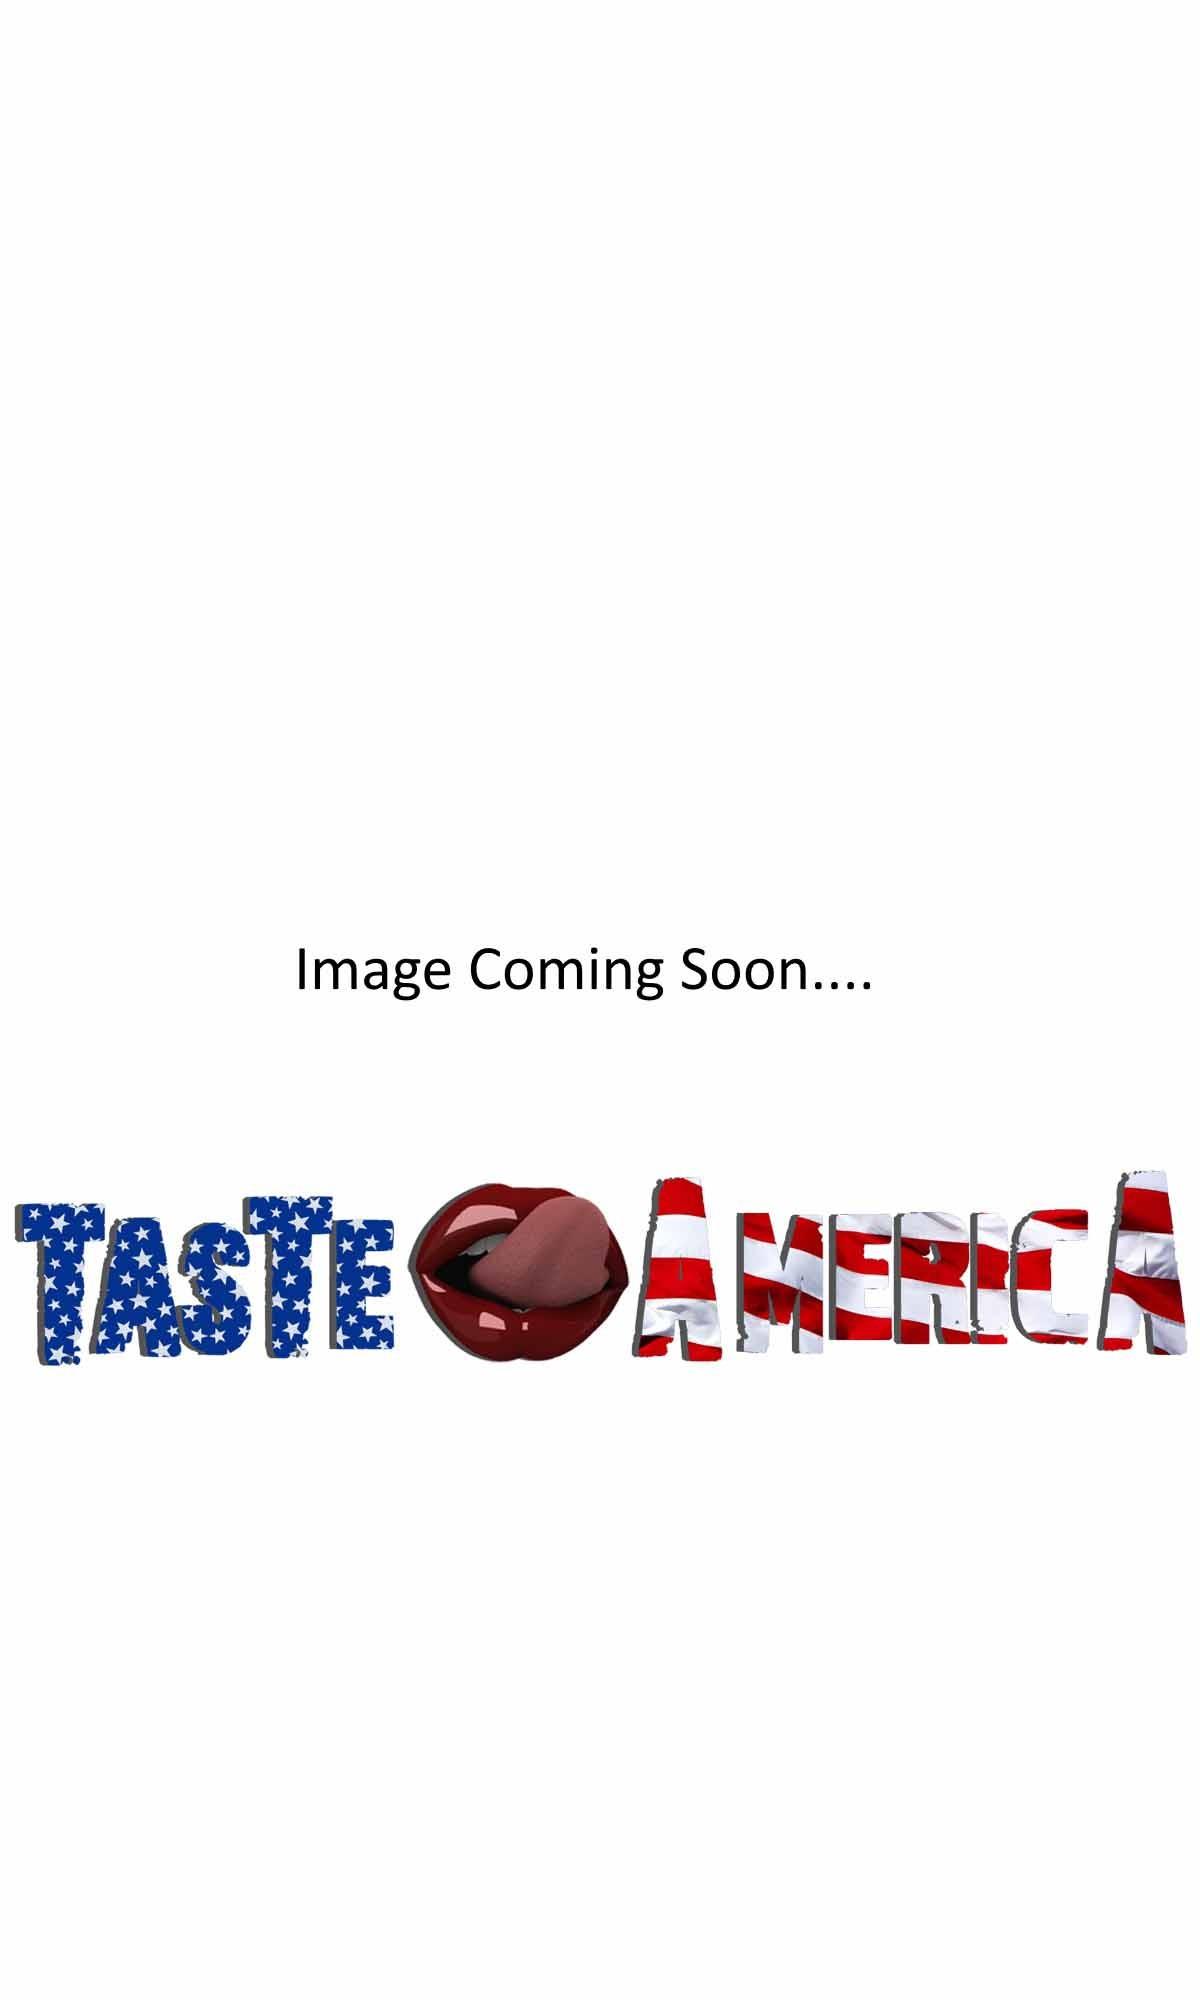 Buy Luzianne Green Iced Tea 24 Family Size Bags At Taste America